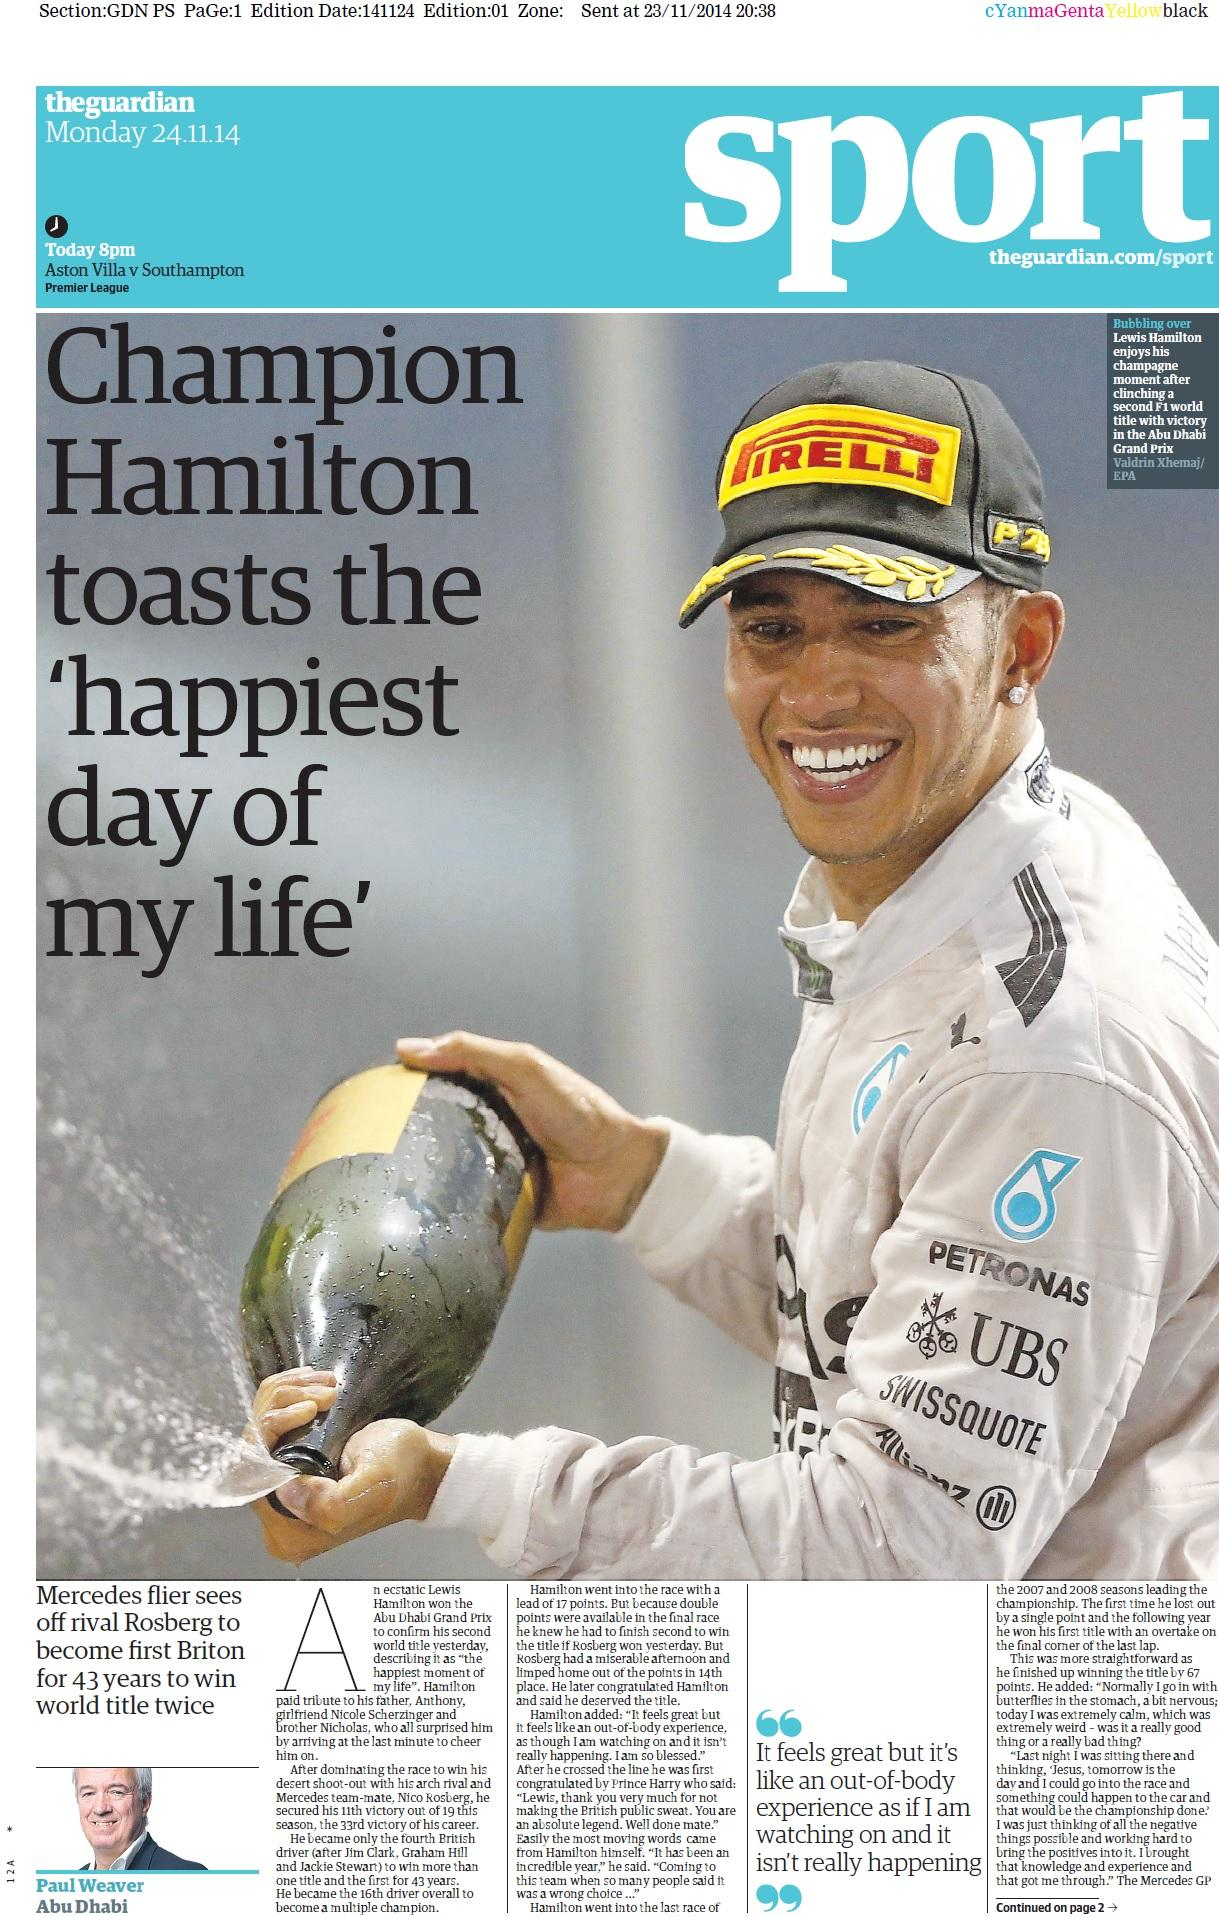 Portada de The Guardian del 24 de Noviembre